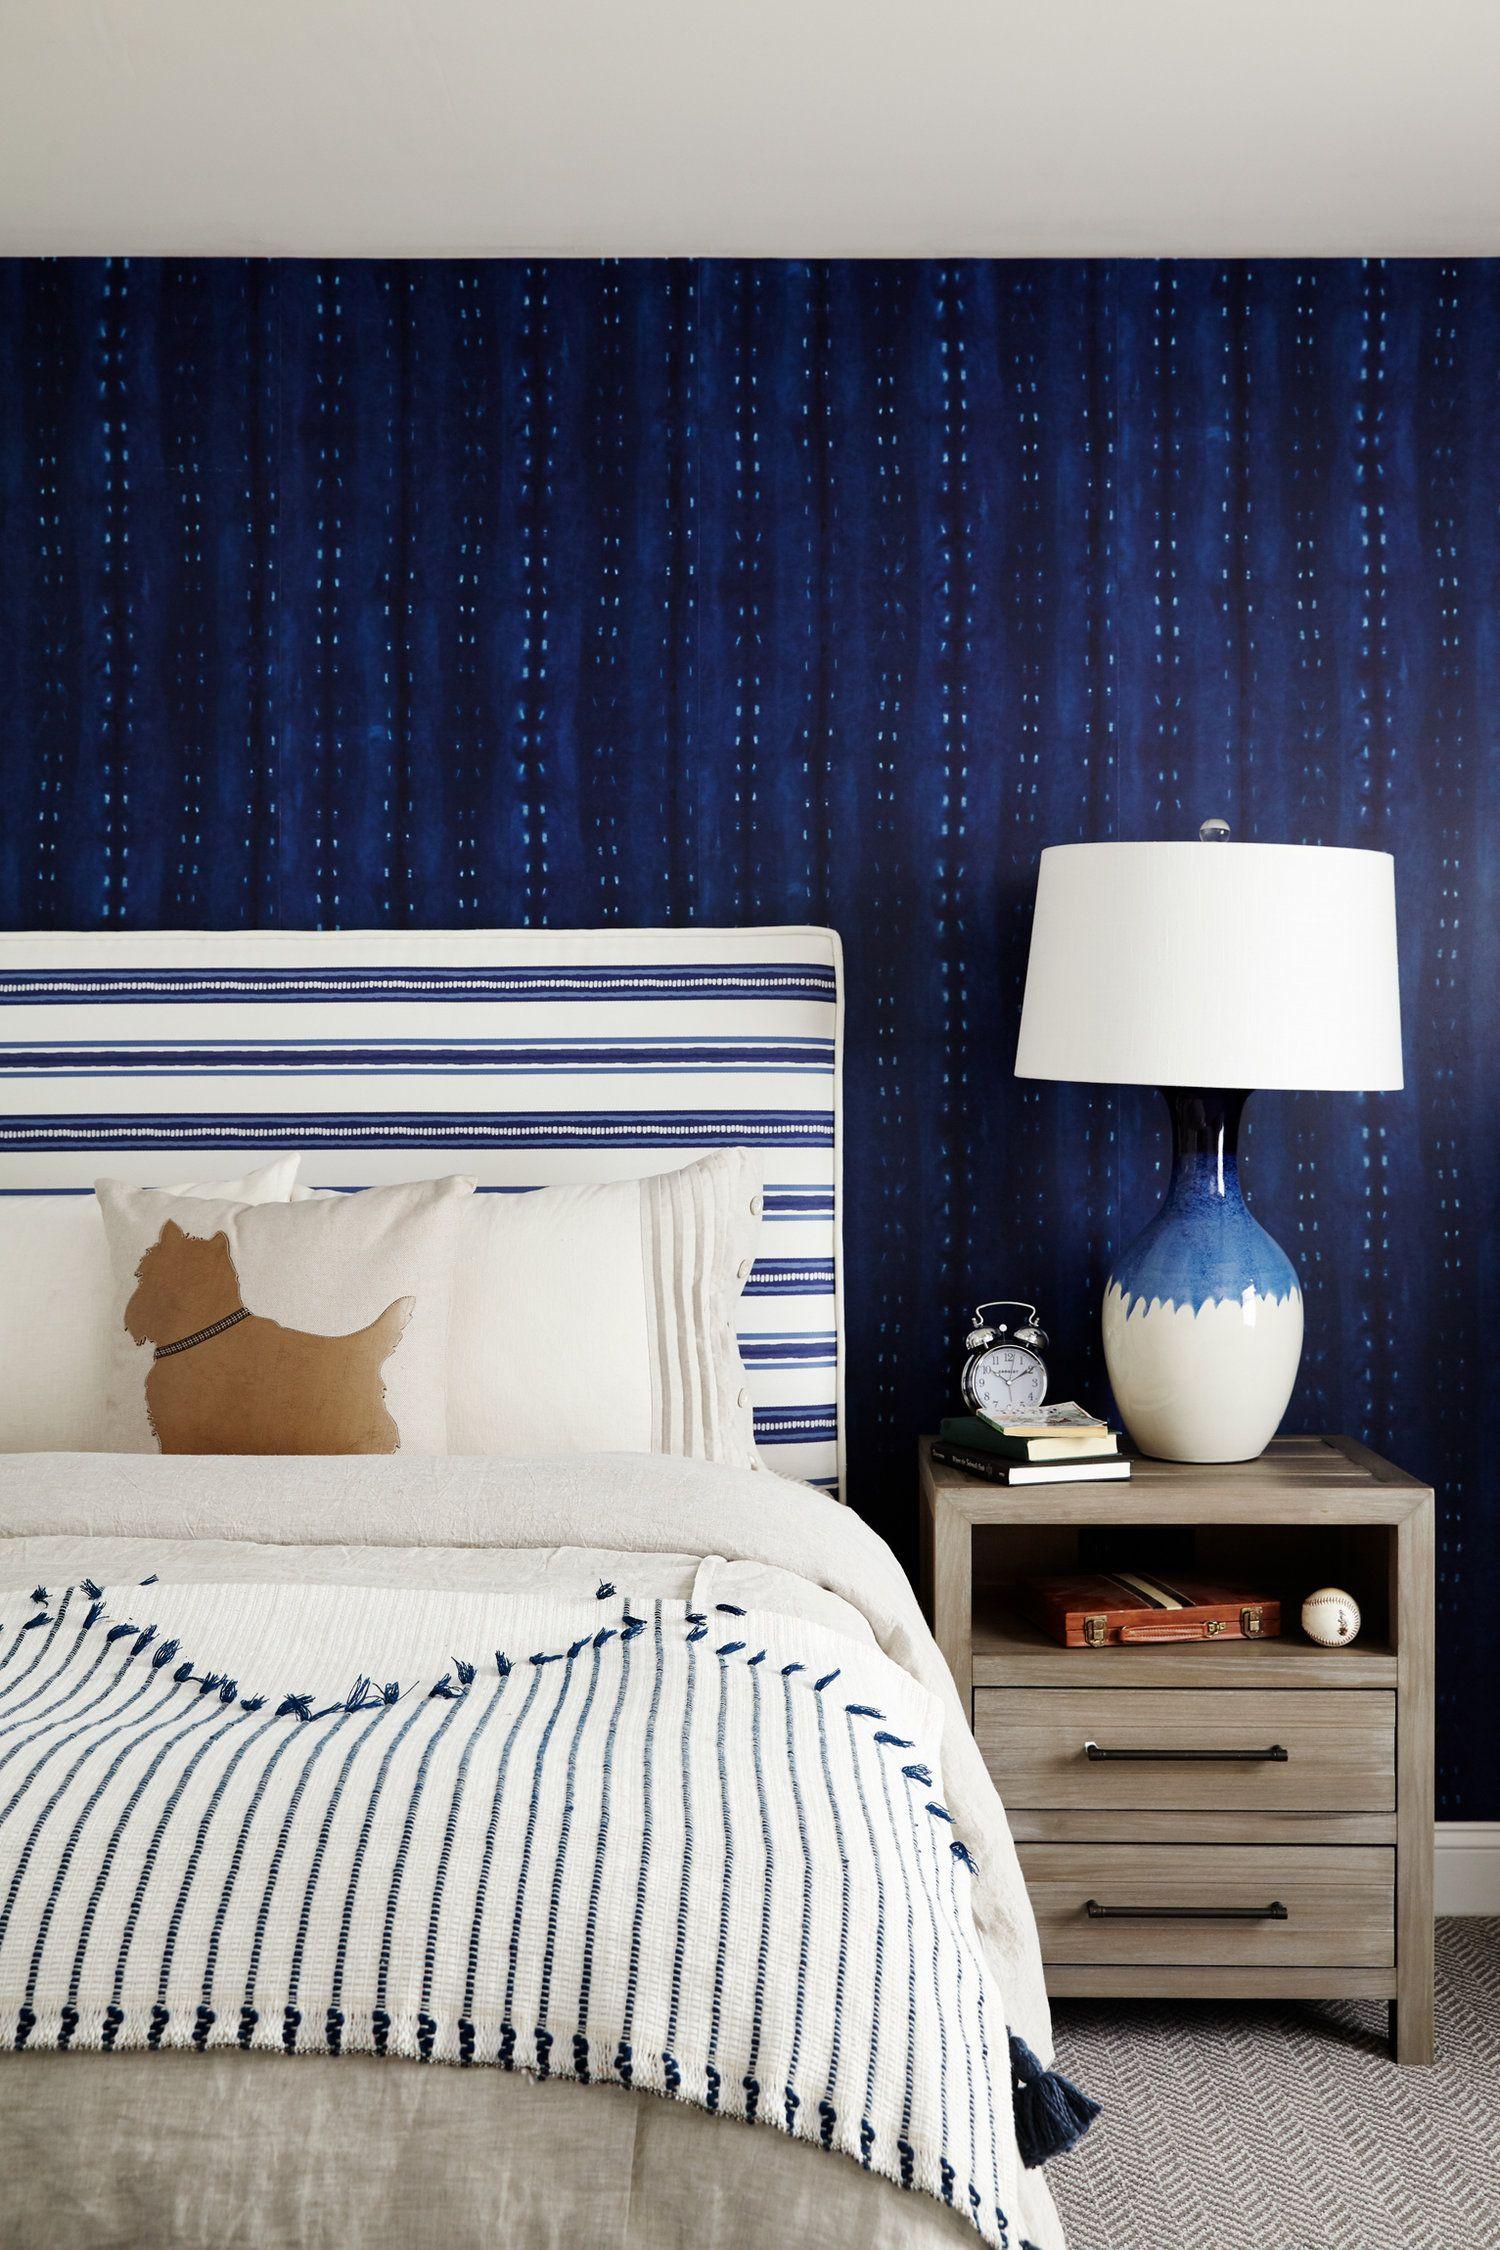 Seatonross Chrisrm 01 Jpg Bedroom Design Diy Bedroom Diy Bedroom Design